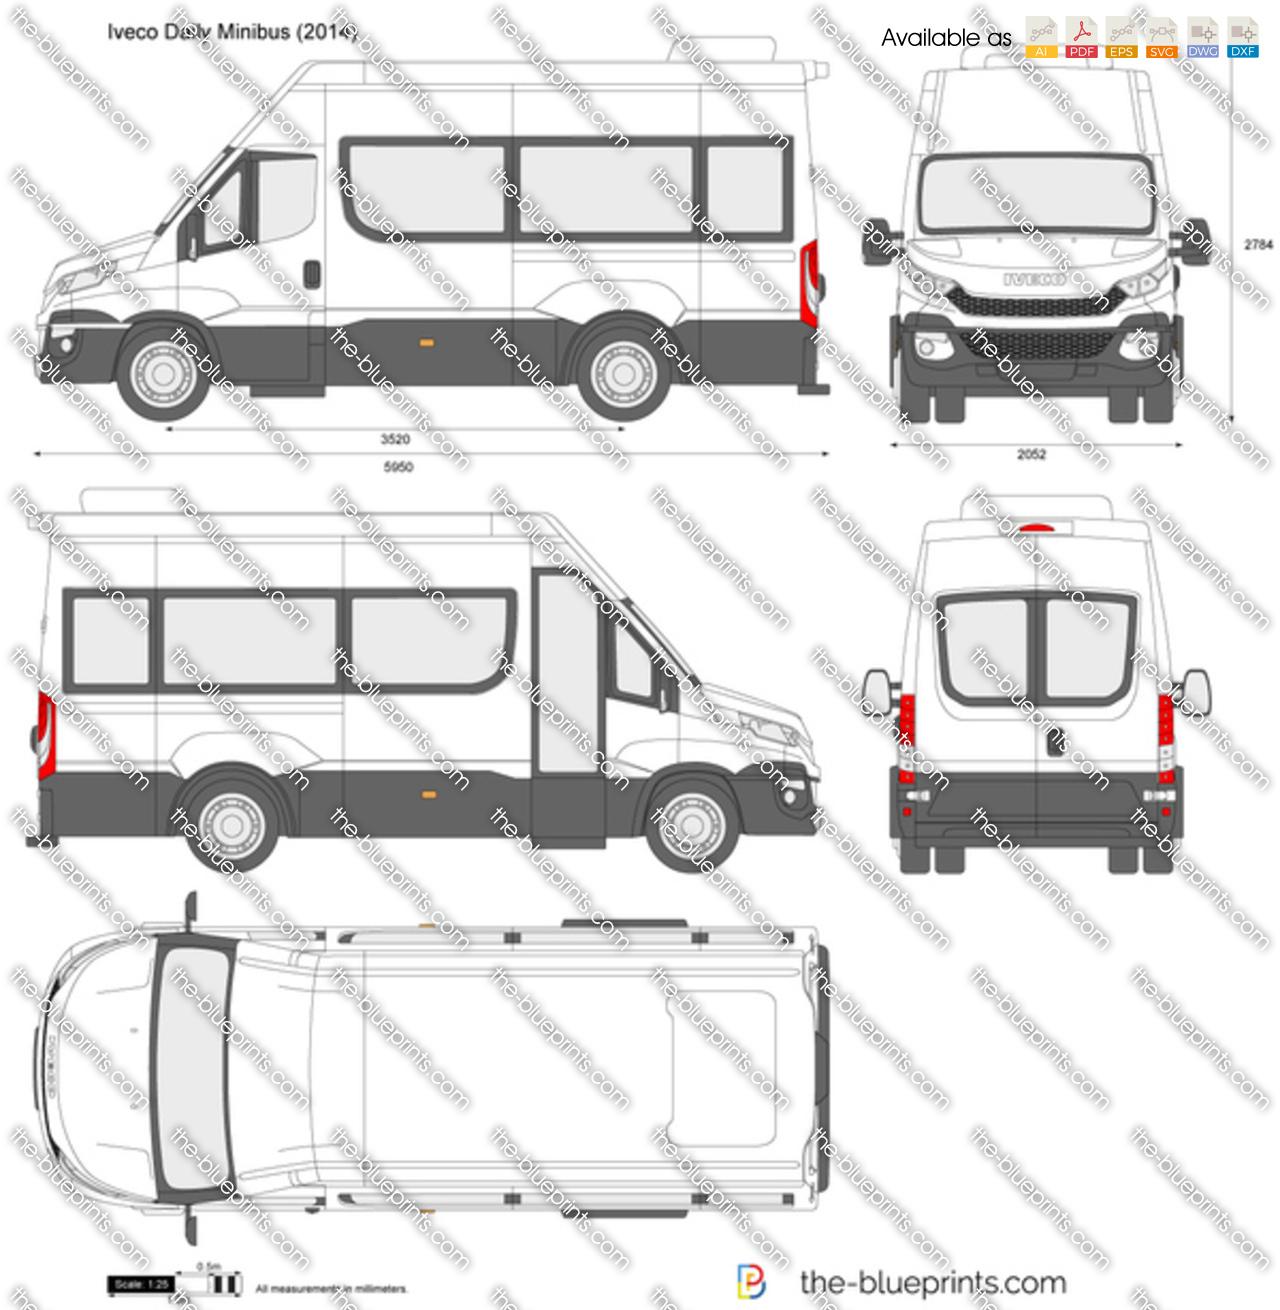 Iveco Daily Minibus 2016